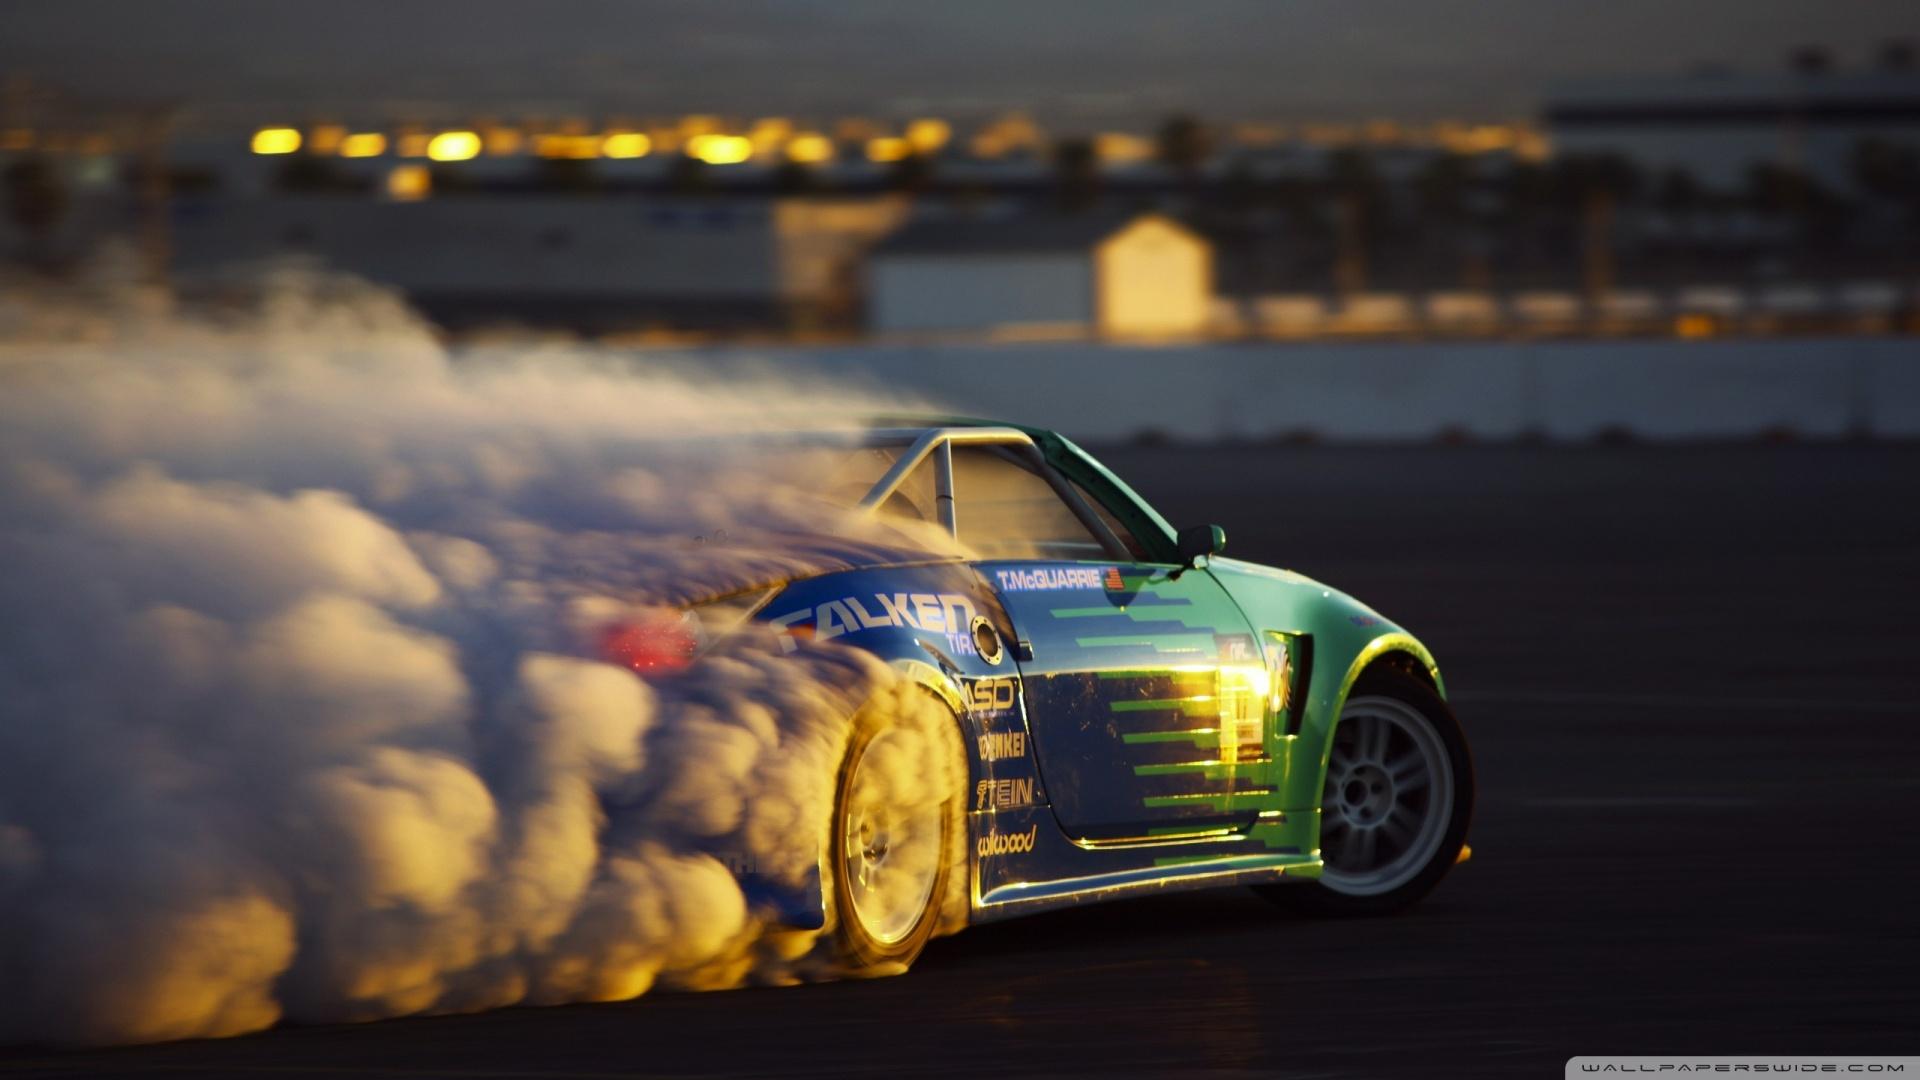 Drifting Motorsport Wallpaper 1920x1080 Drifting Motorsport 1920x1080